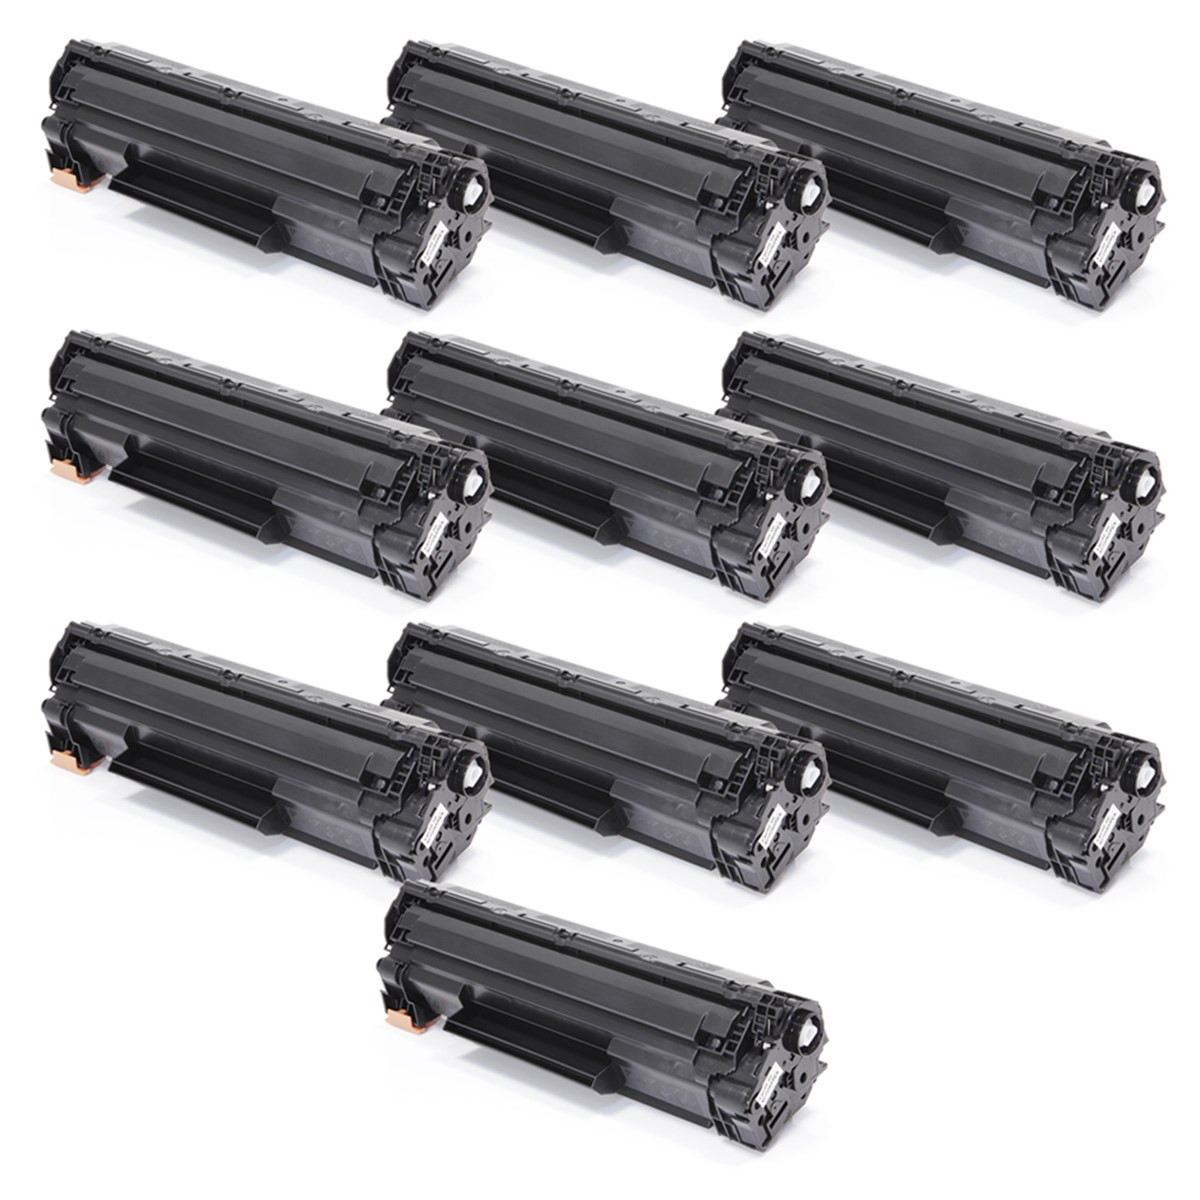 Kit 10 Toner Compatível com HP P1505 M1120 M1132 P1102 | 85A 36A 35A Universal Premium 1.8k